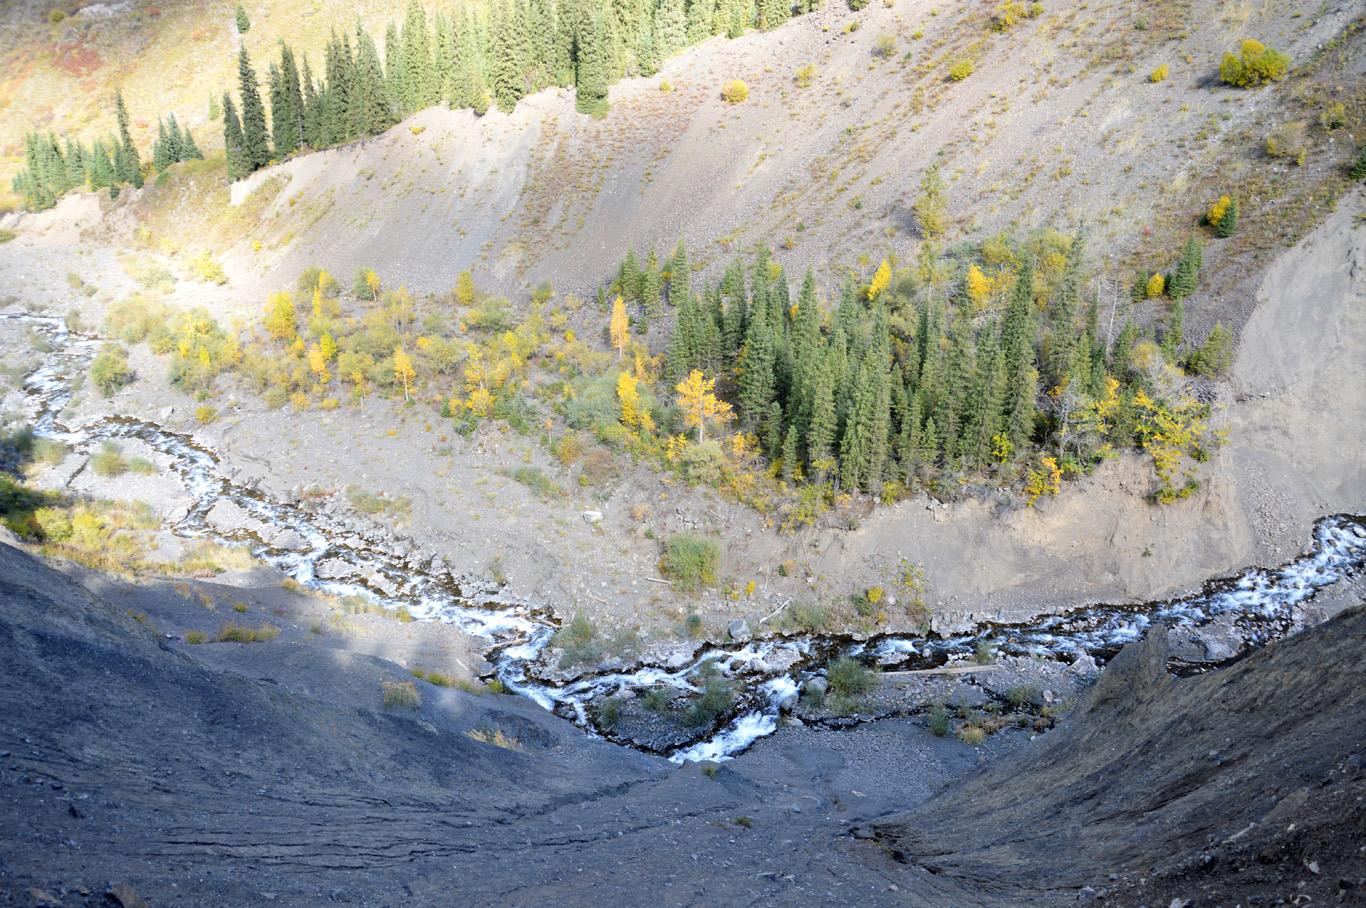 River Kaindy gorge